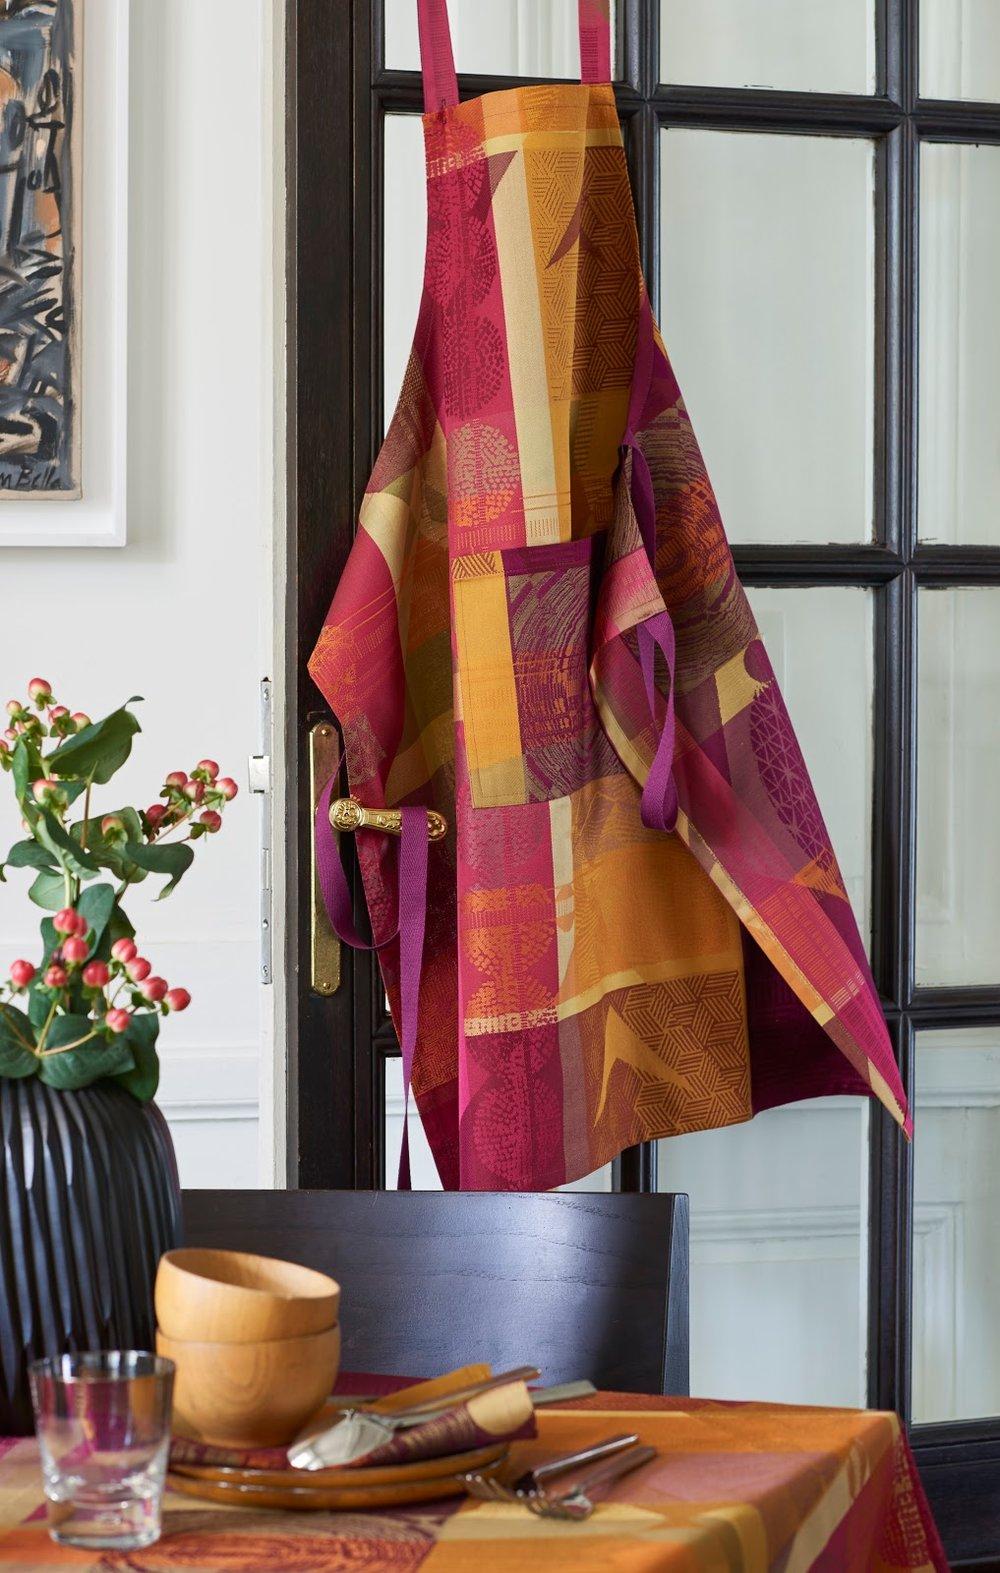 Mille Tingari Terre Rouge Apron  ,  Mille Tingari Terre Rouge Tablecloth , and  Mille Tingari Terre Rouge Napkin